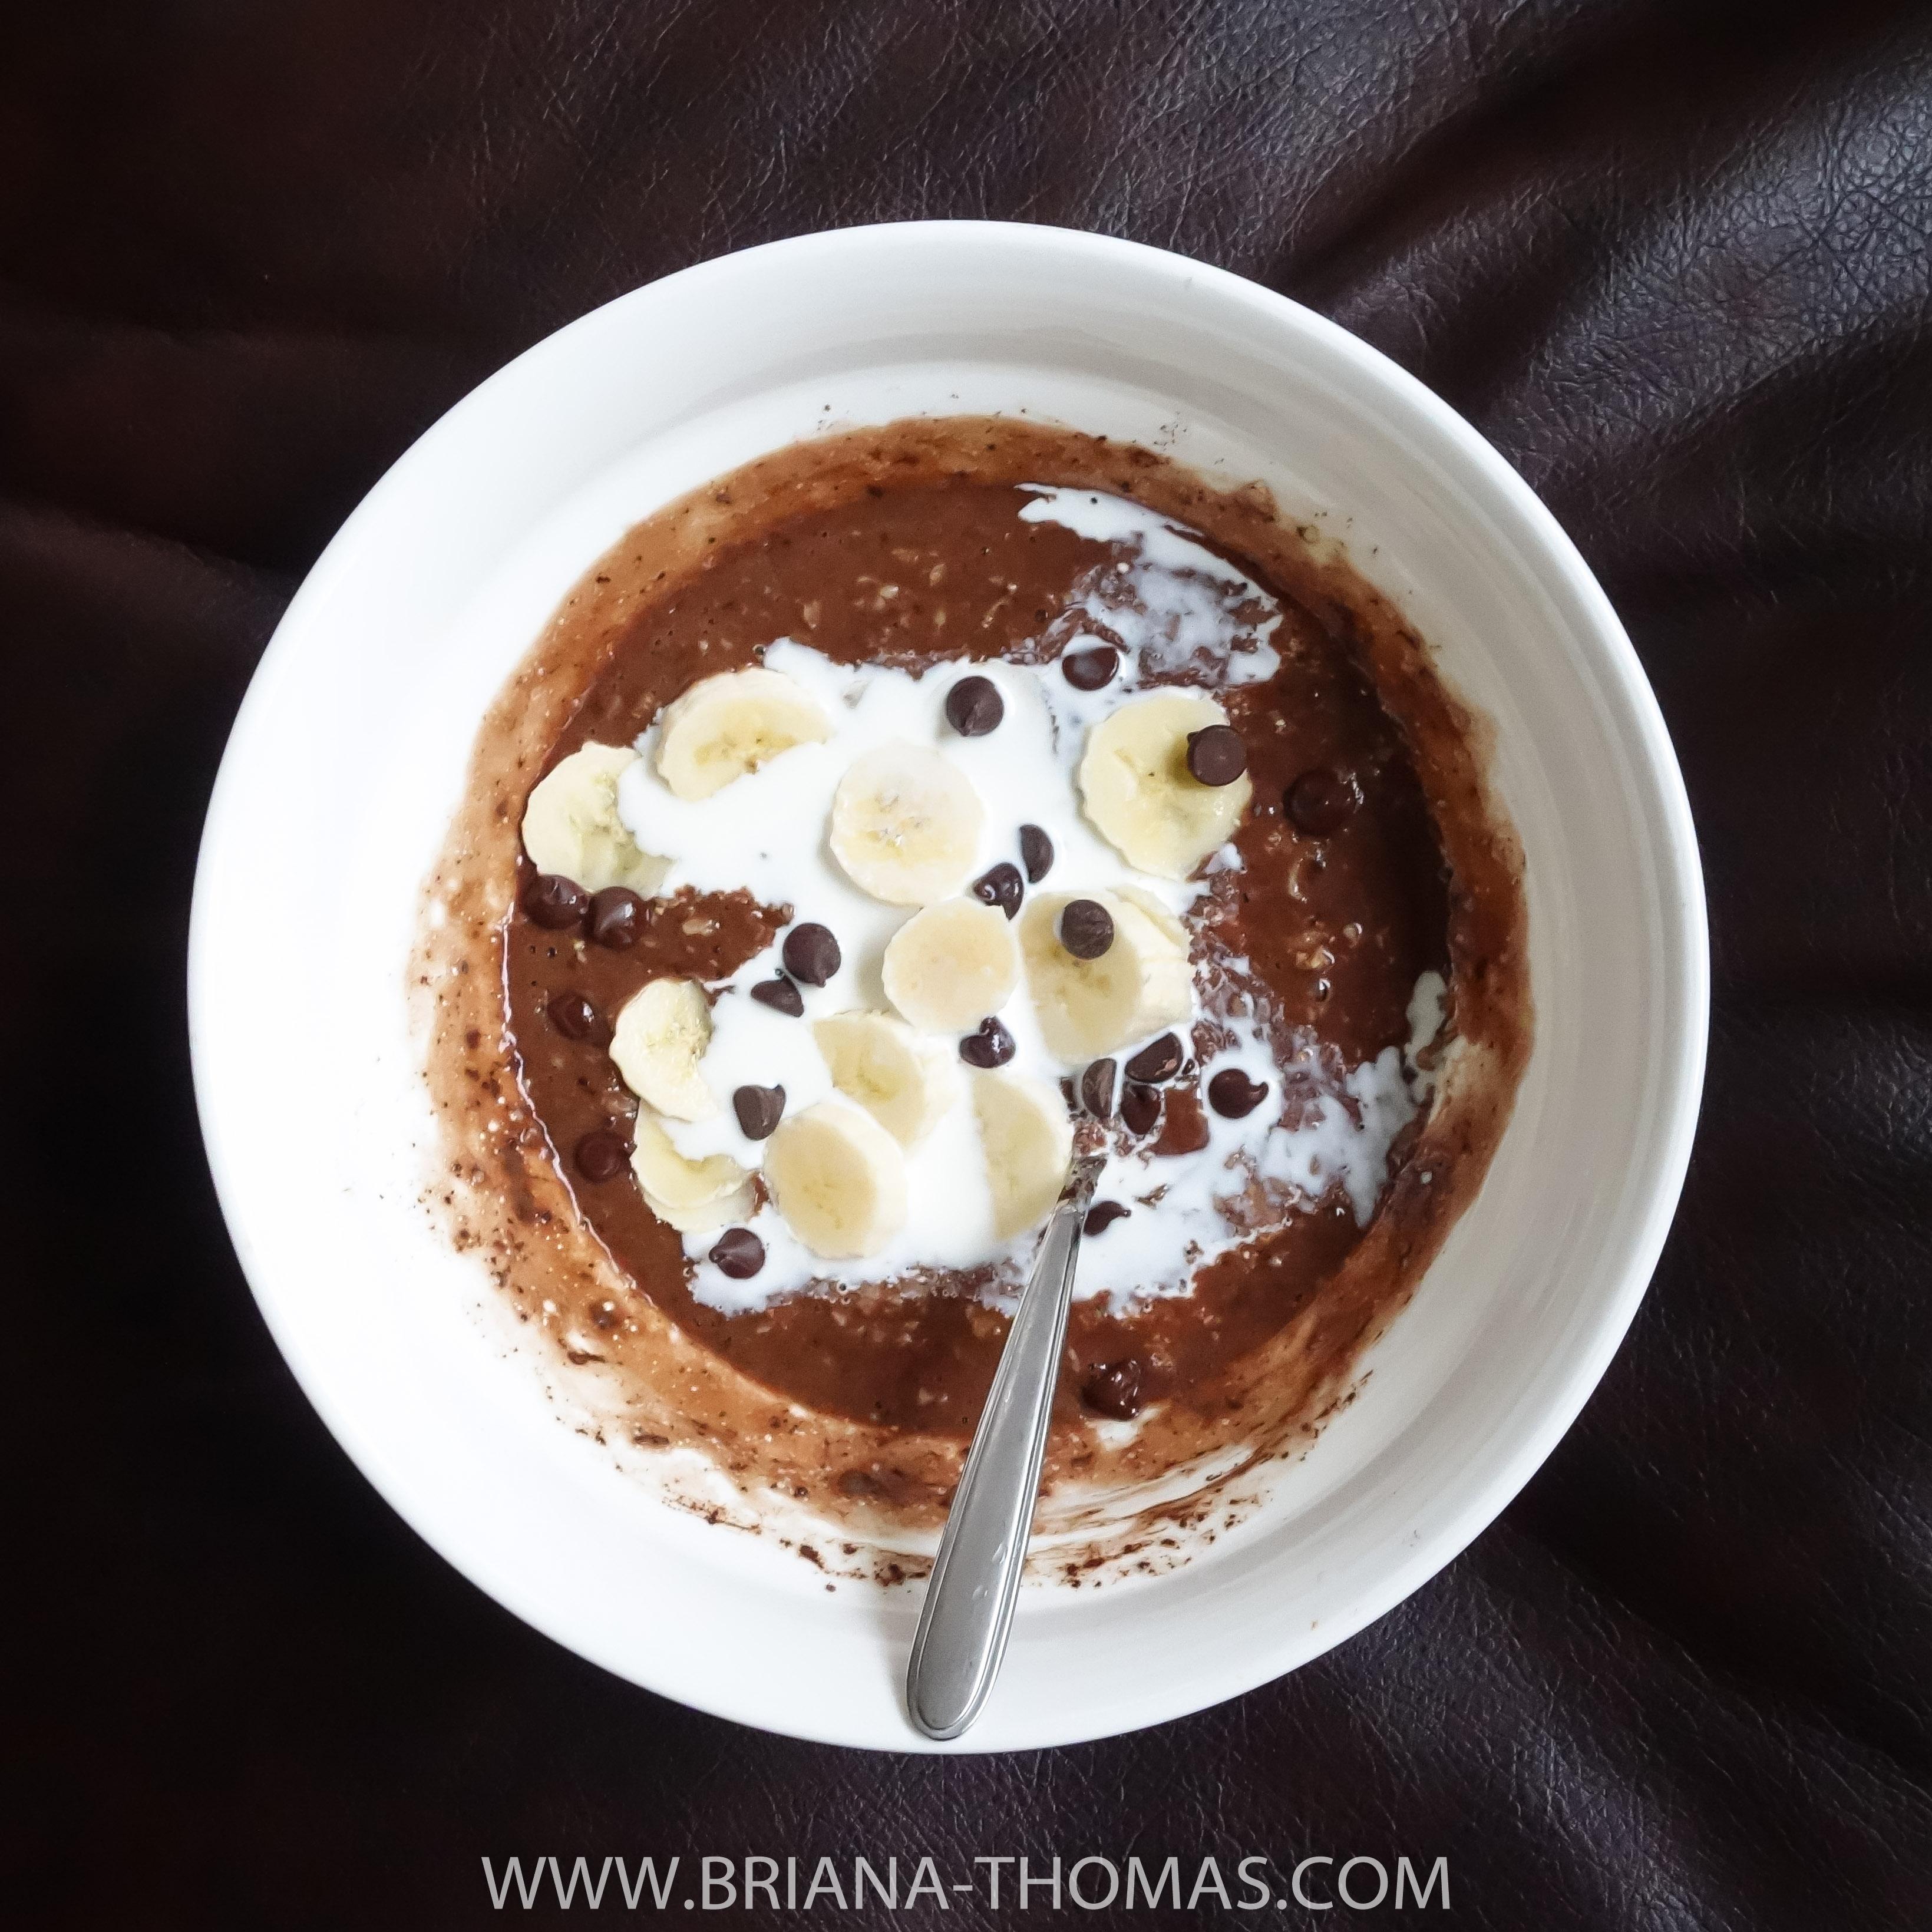 Easy Chocolate Oatmeal - www.briana-thomas.com